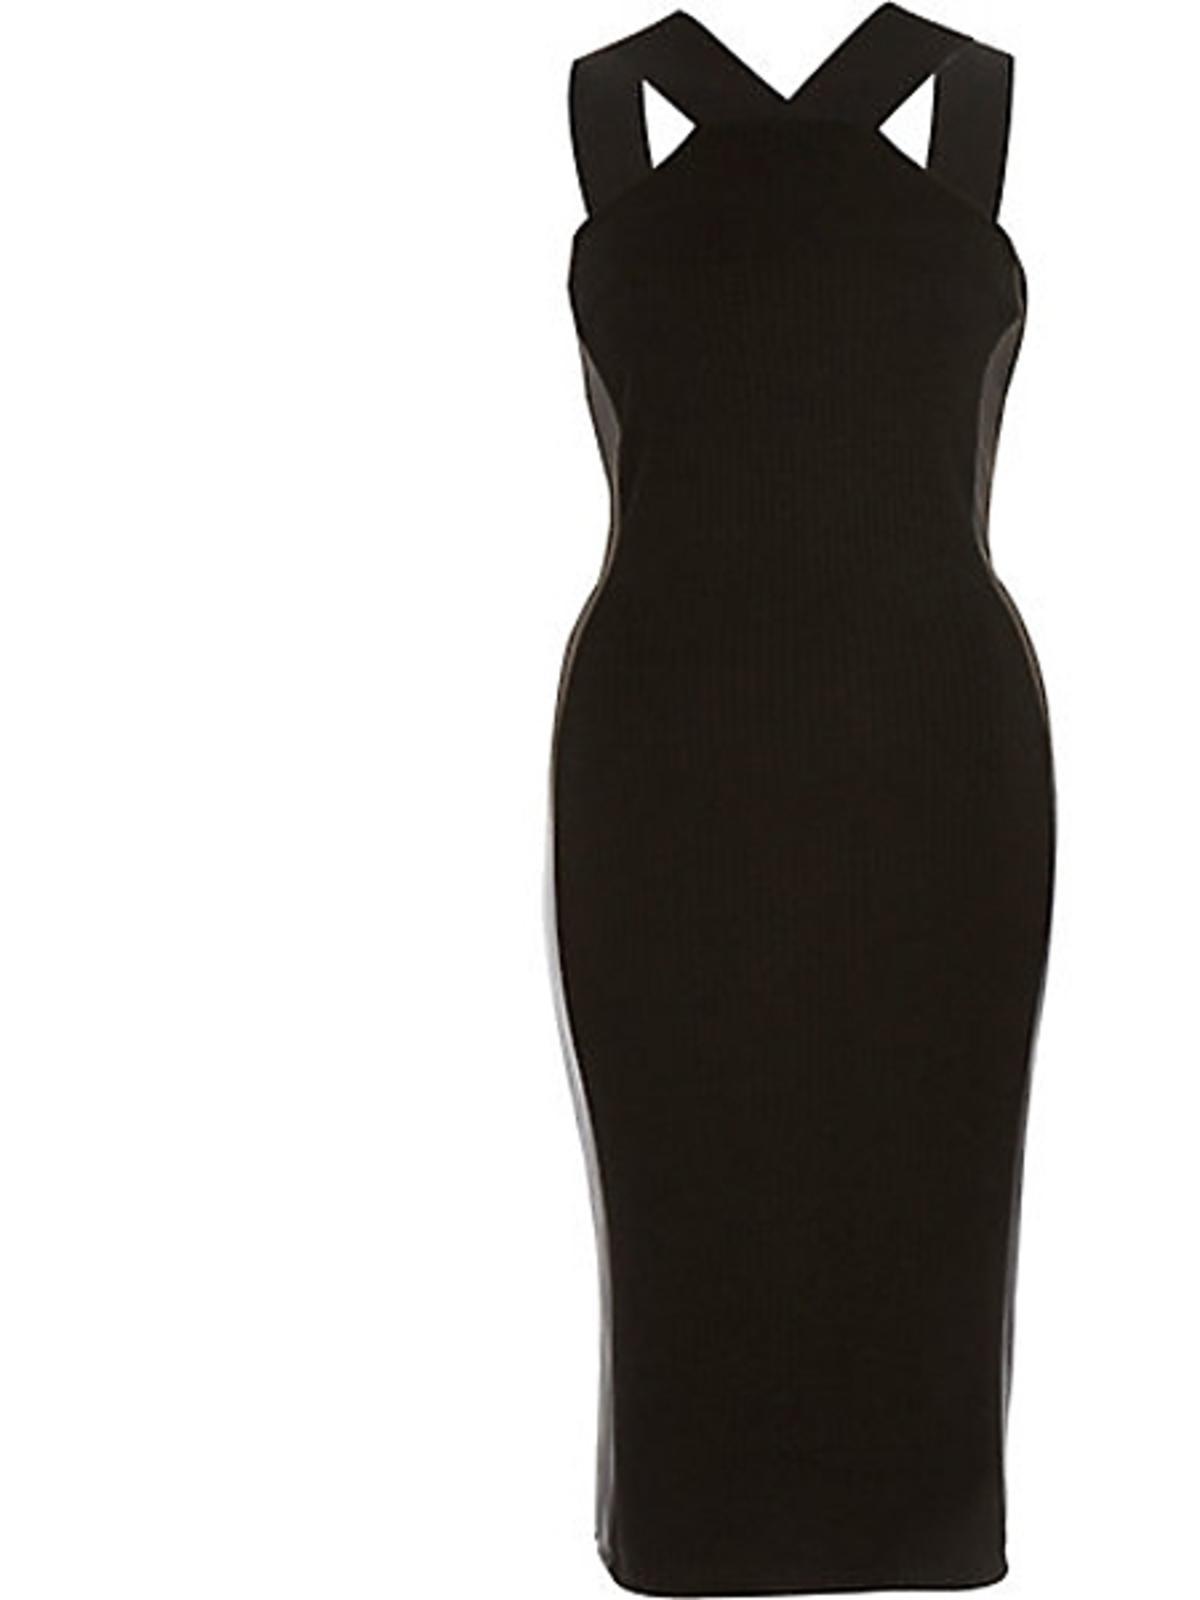 Czarna sukienka River Island, cena